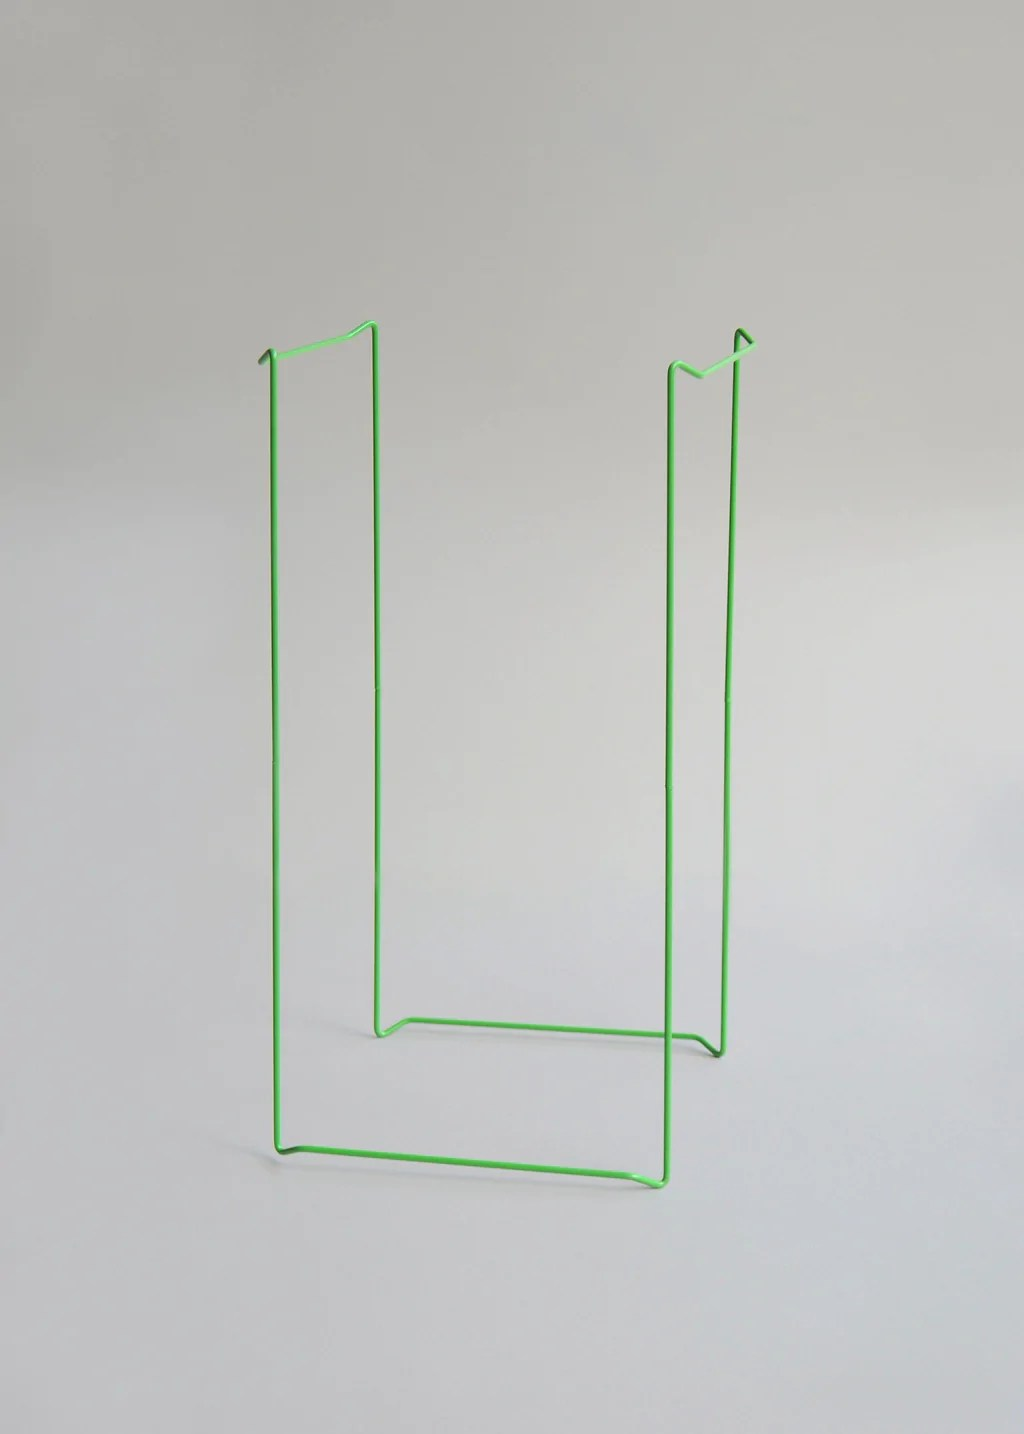 small resolution of diagram of plastic bag